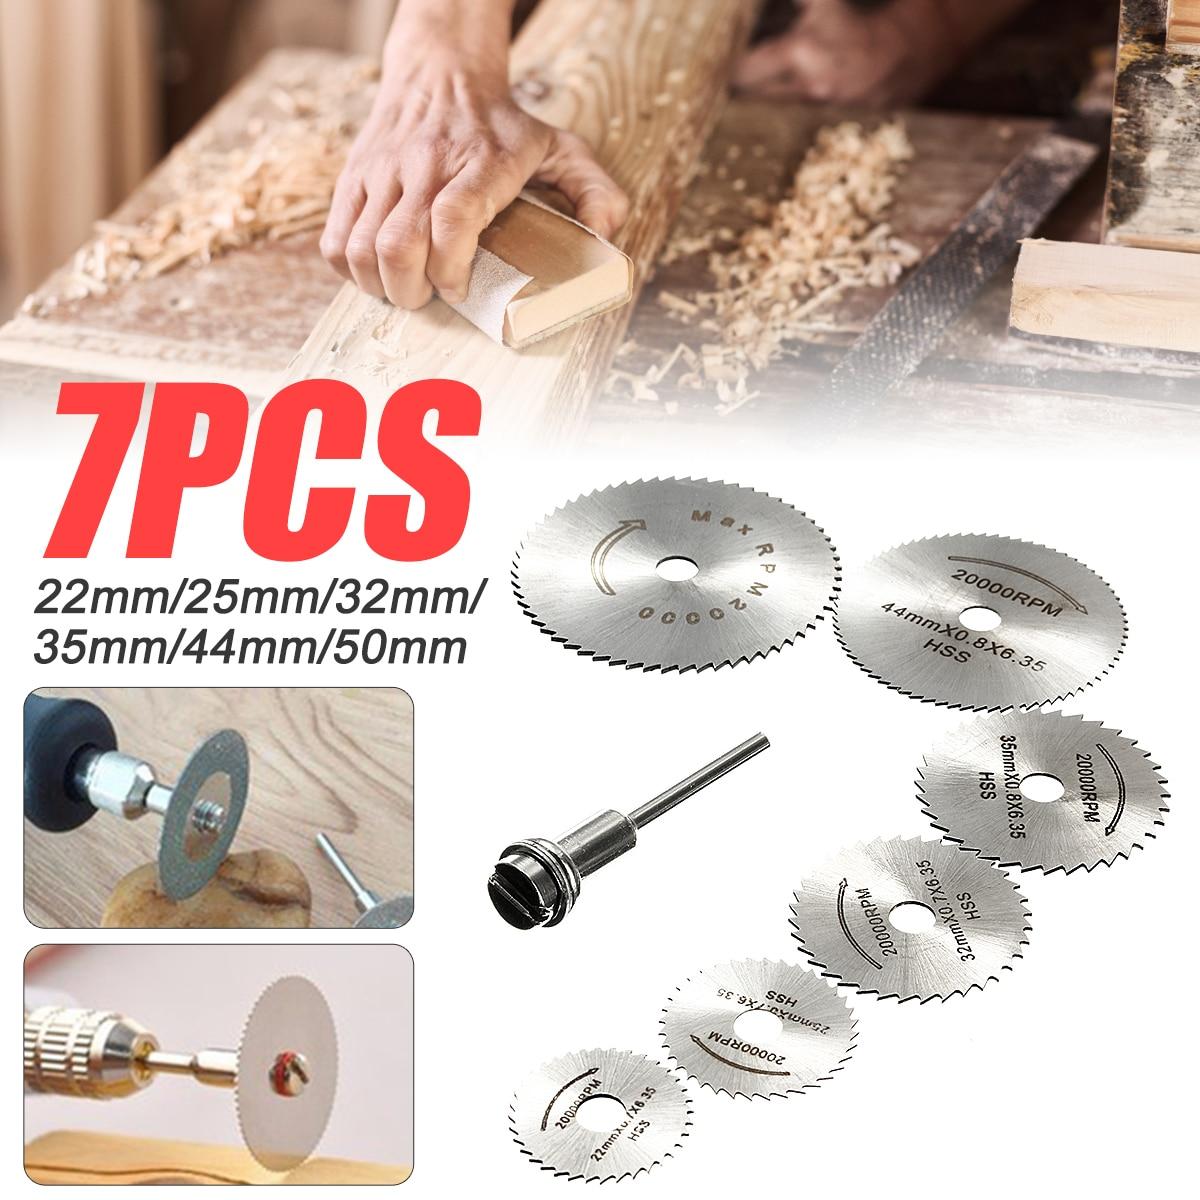 6Pcs HSS Circular Saw Blade + 1Pcs HSS Circular Rotary Blade Wheel Discs Mandrel For Wood Cutting Saws Tool Accessories Kit Saws